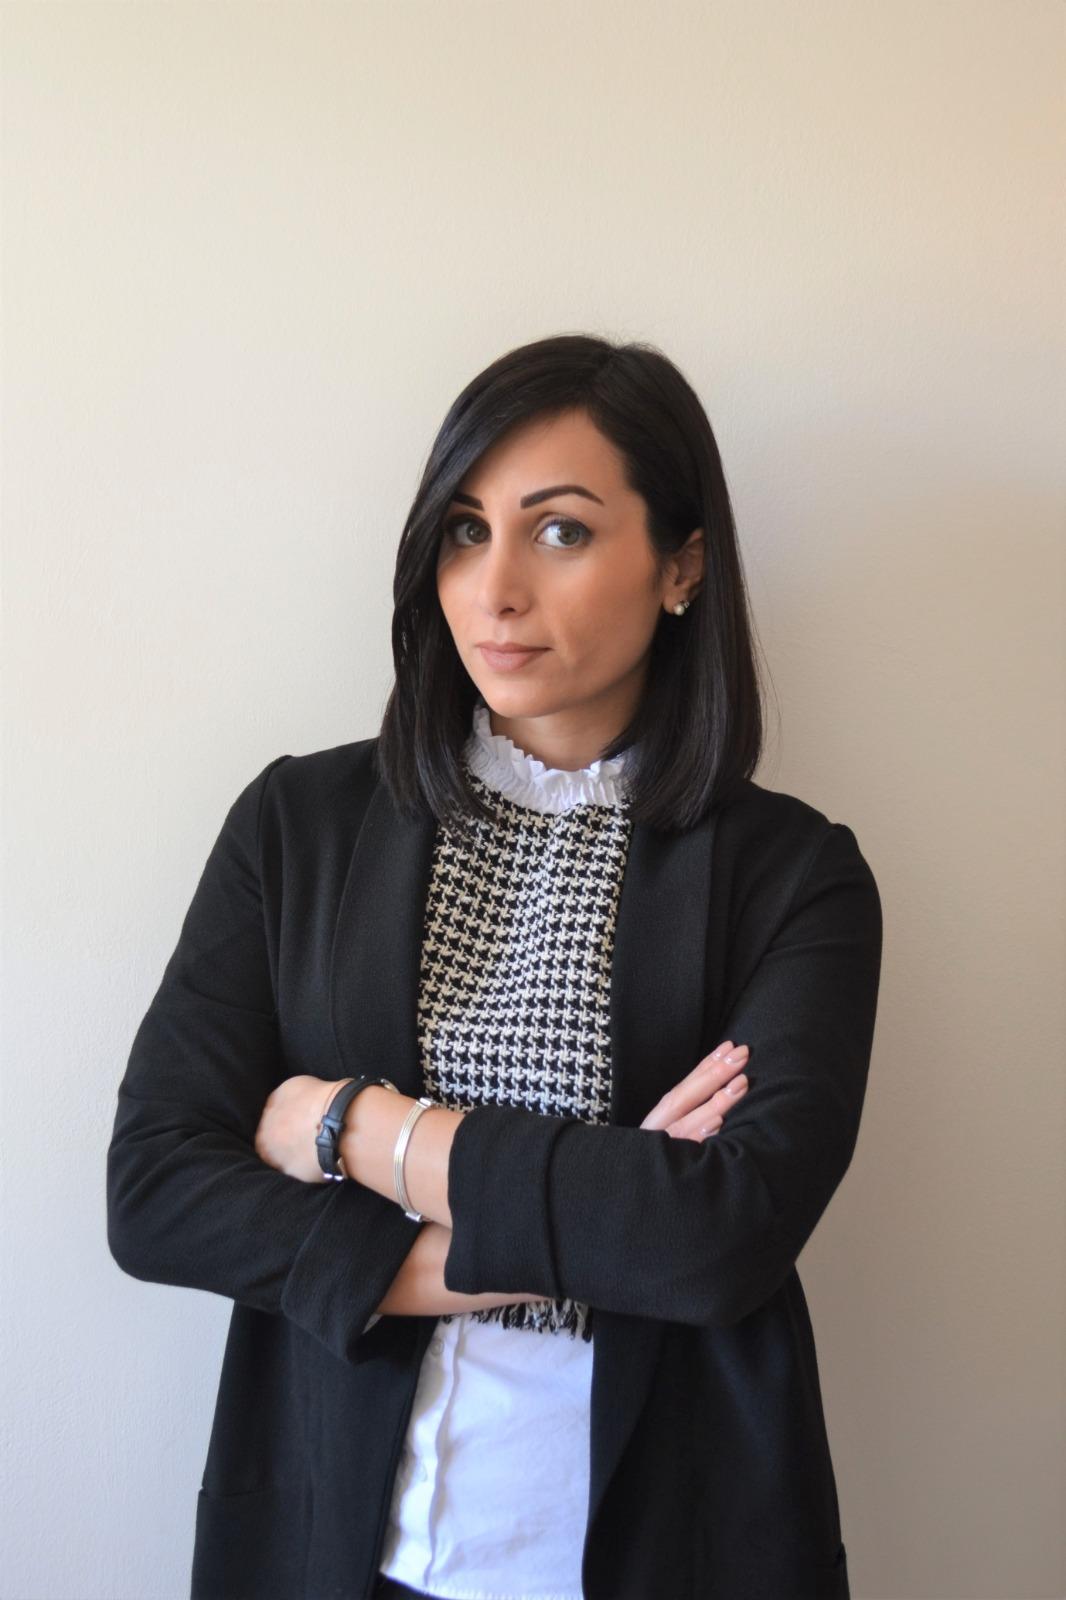 Valeria Campinoti